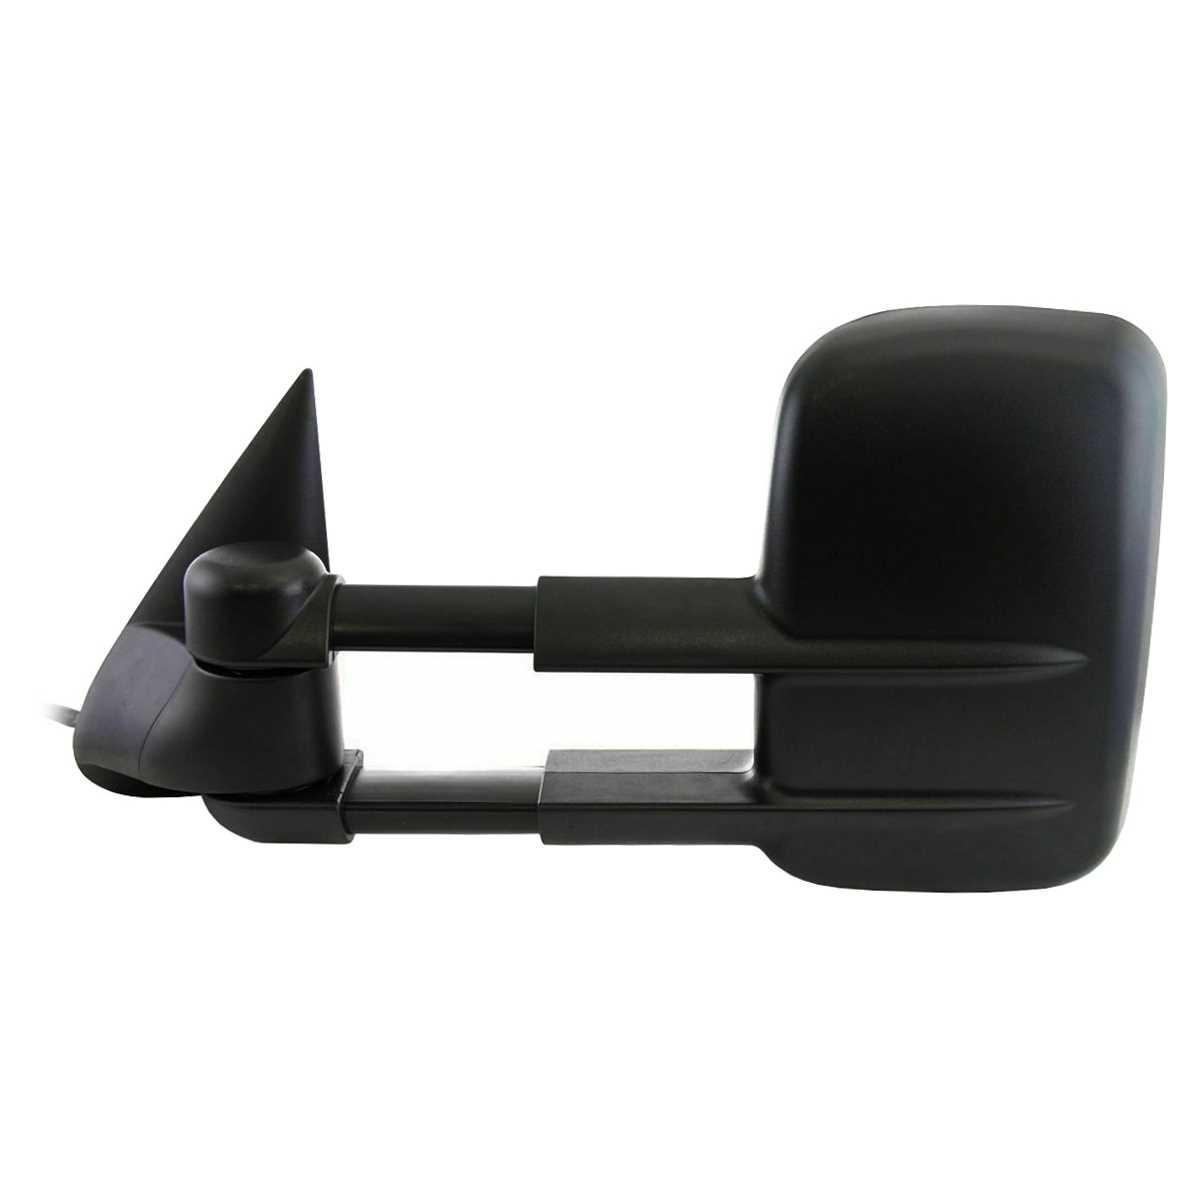 New-Pair-Power-Heated-Signal-Side-Mirror-Fits-2003-2006-Chevrolet-Silverado-1500 thumbnail 5